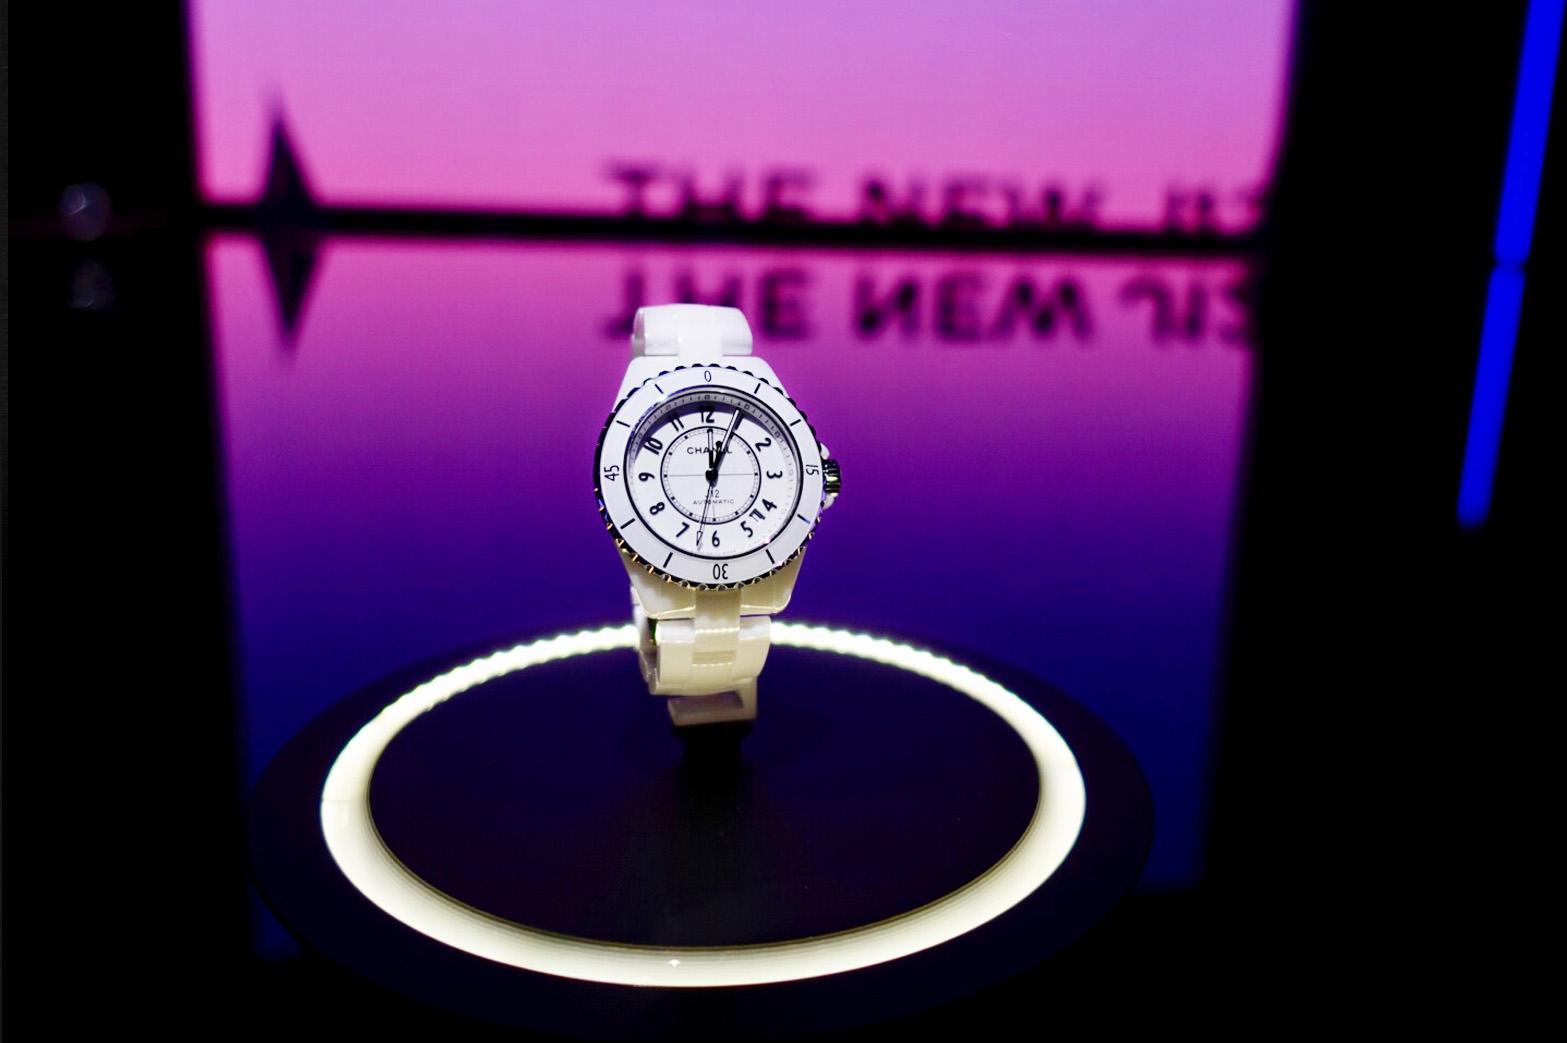 Chanel new J12 watch